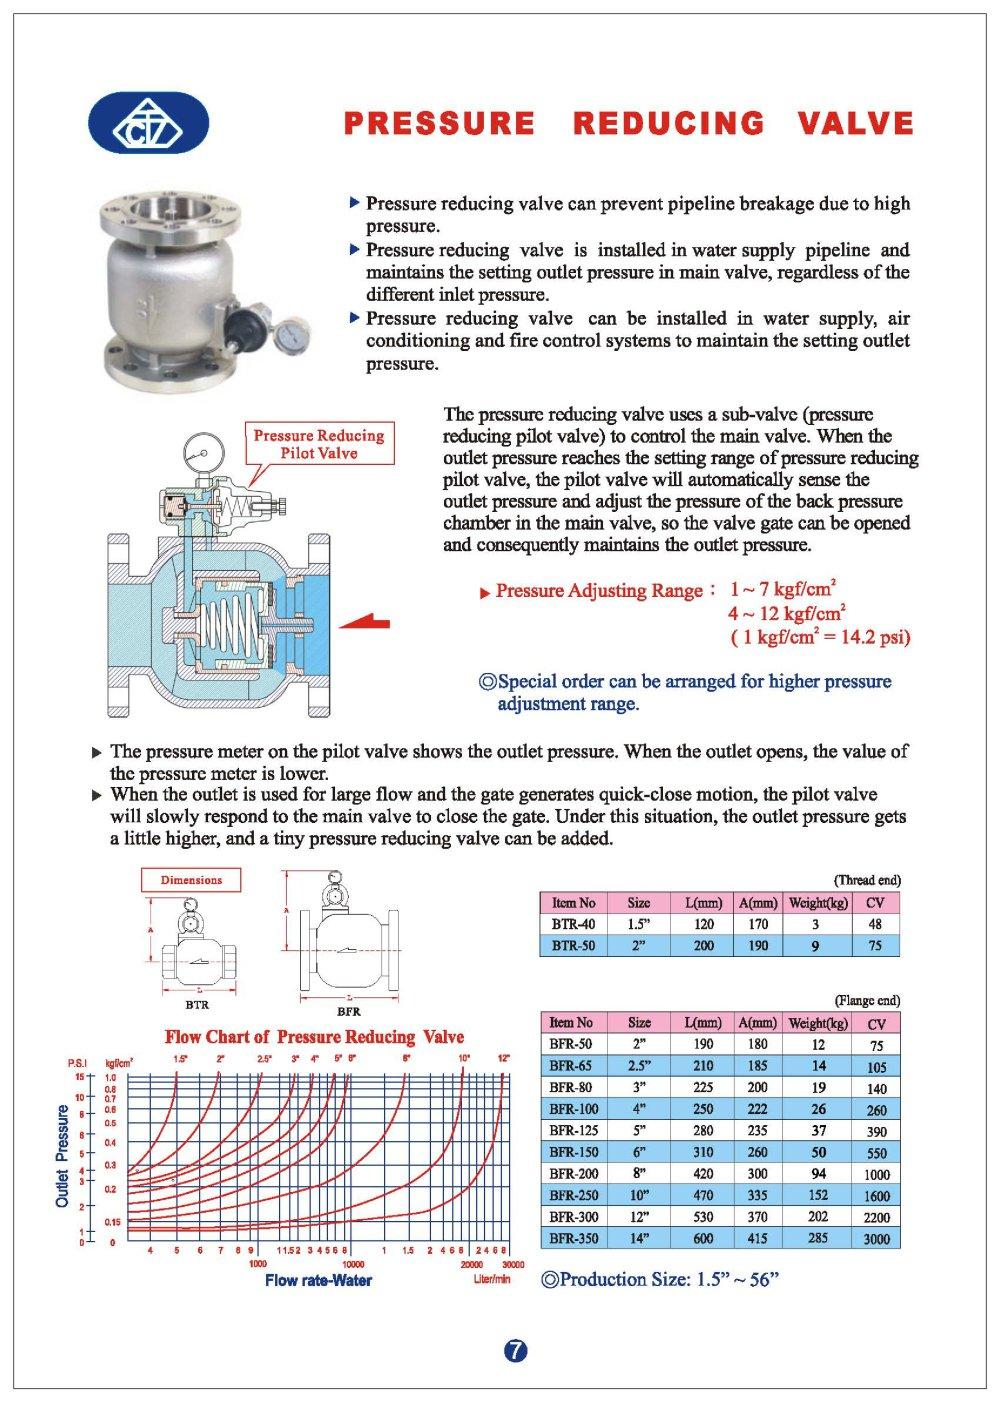 Pressure reducing valve elite line industrial corp pdf pressure reducing valve 1 1 pages nvjuhfo Choice Image